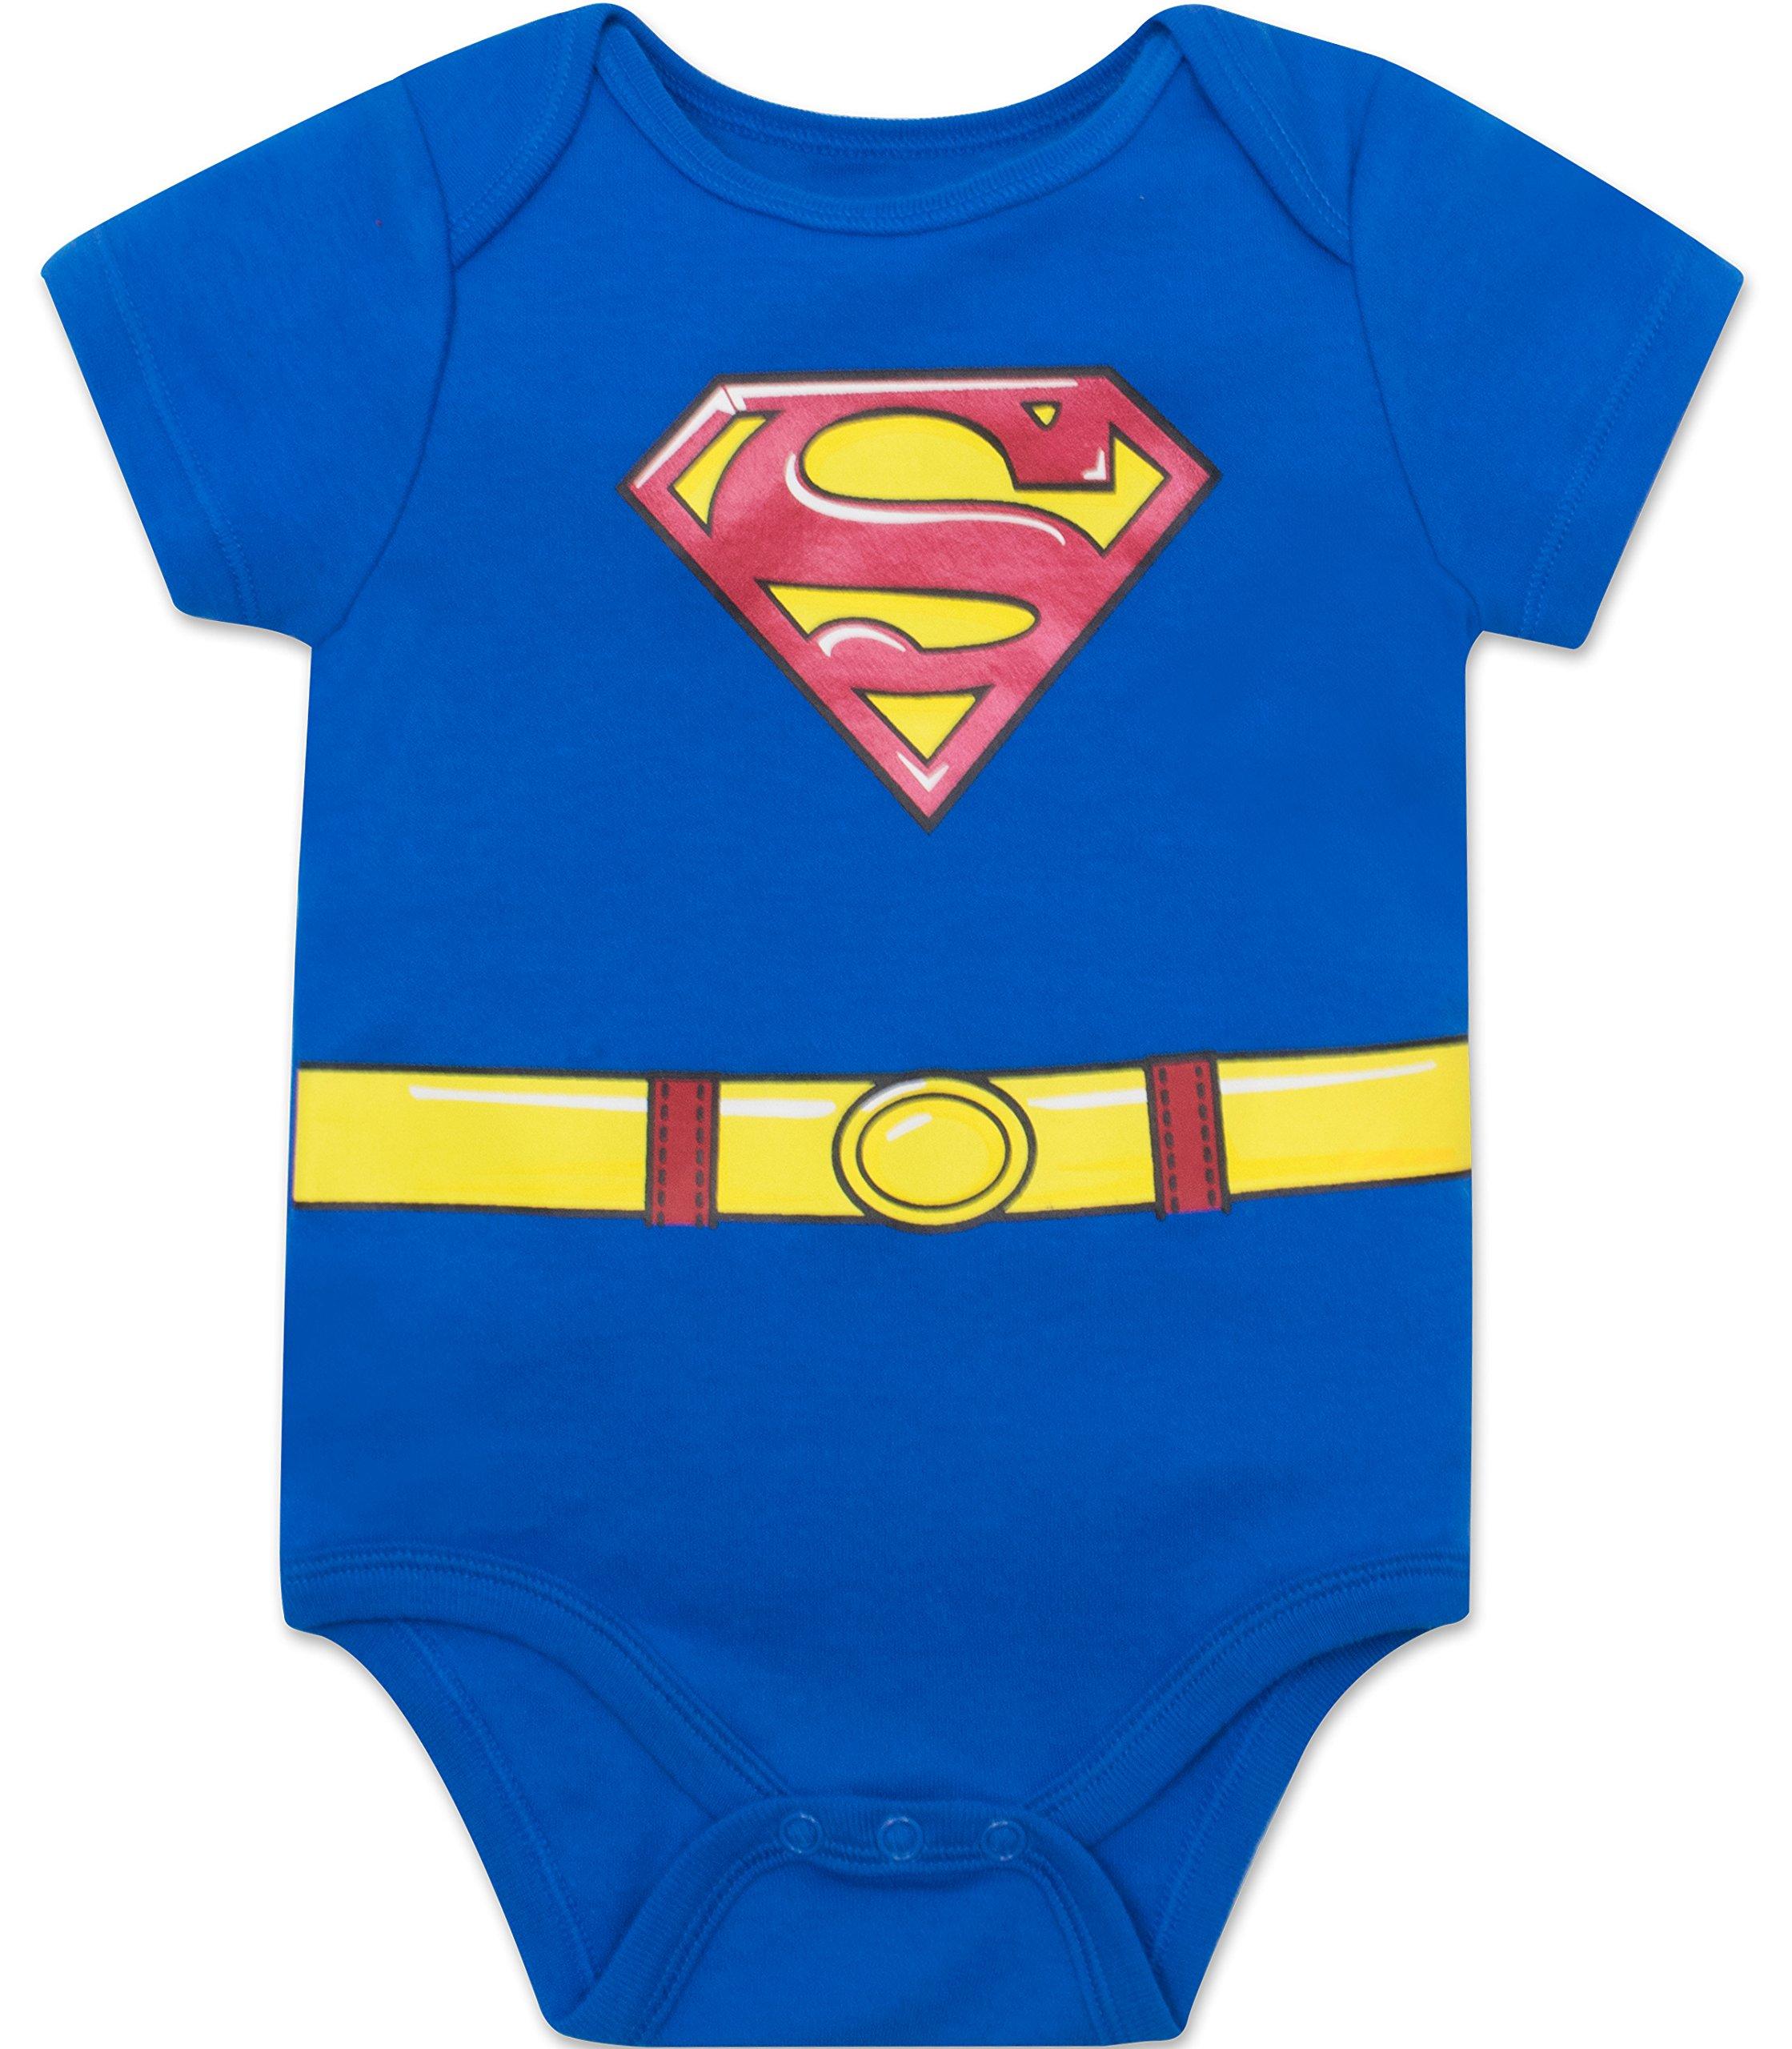 Justice League Baby Boys' 5 Pack Superhero Onesies - Batman, Superman, The Flash and Green Lantern (6-9M) by Warner Bros. (Image #5)